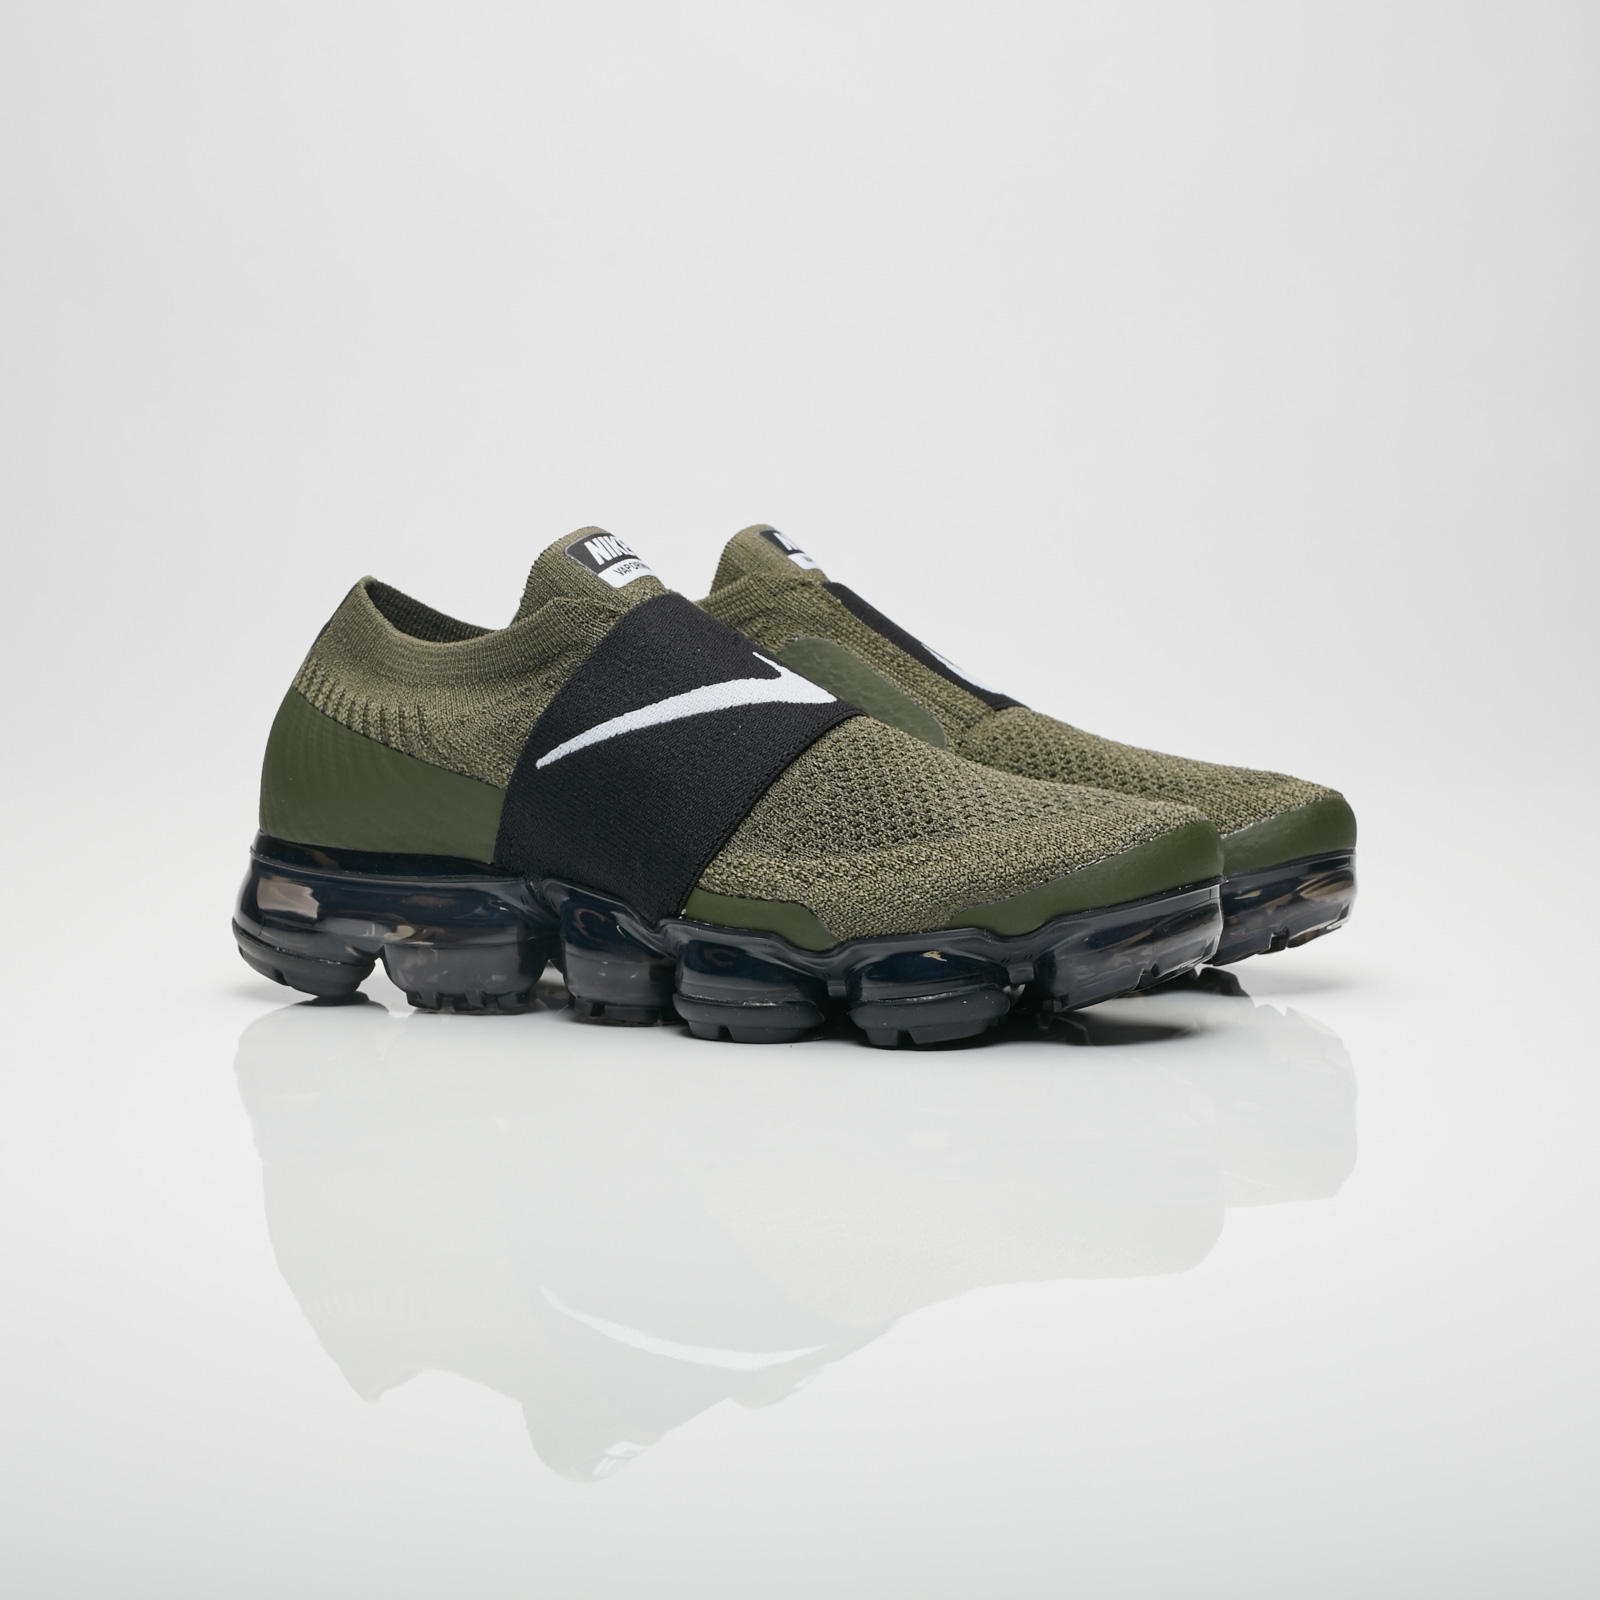 nike air vapormax flyknit moc aa4155 300 sneakersnstuff